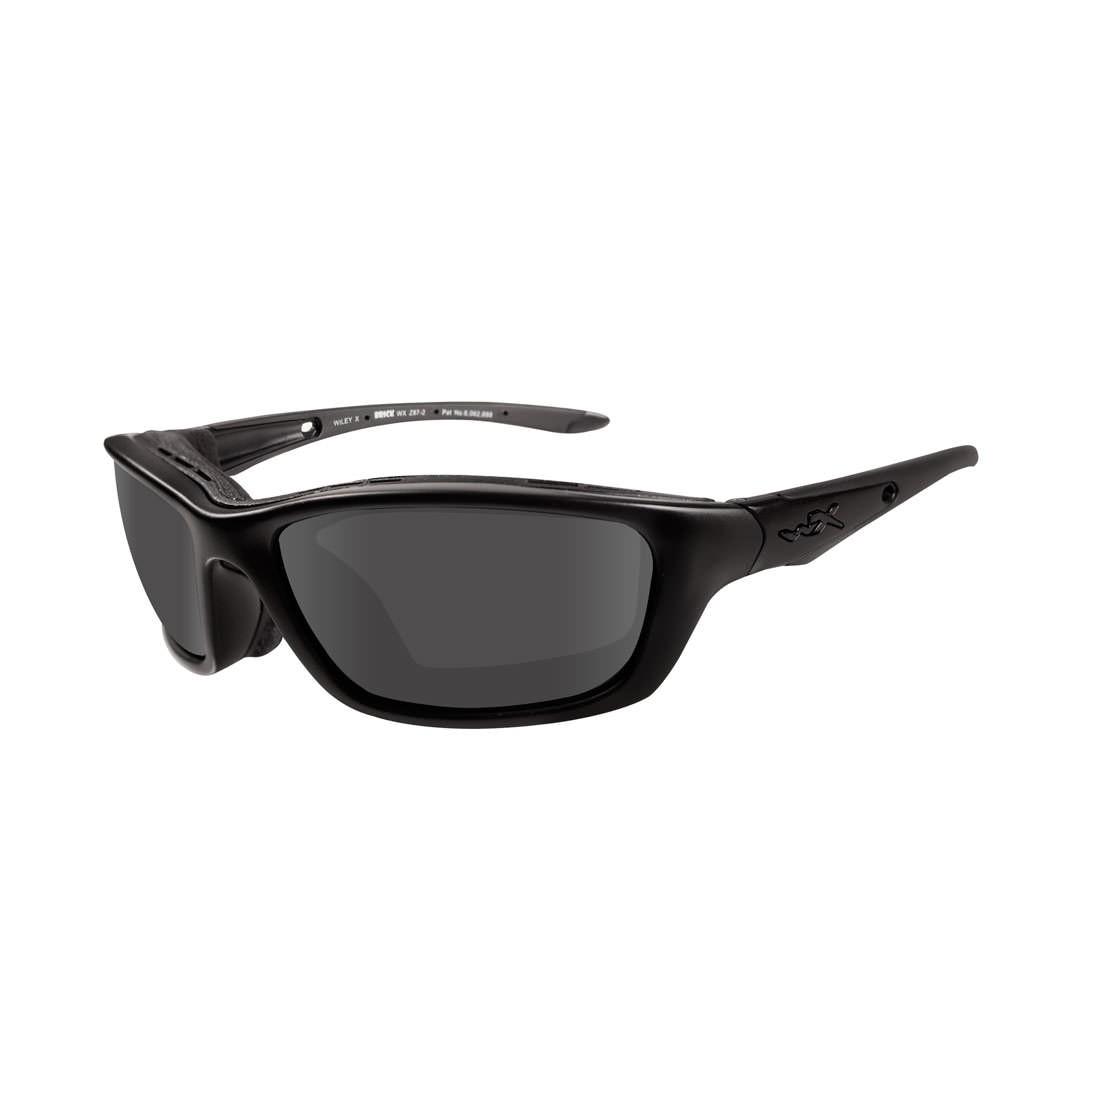 Brick Black Ops Sunglasses